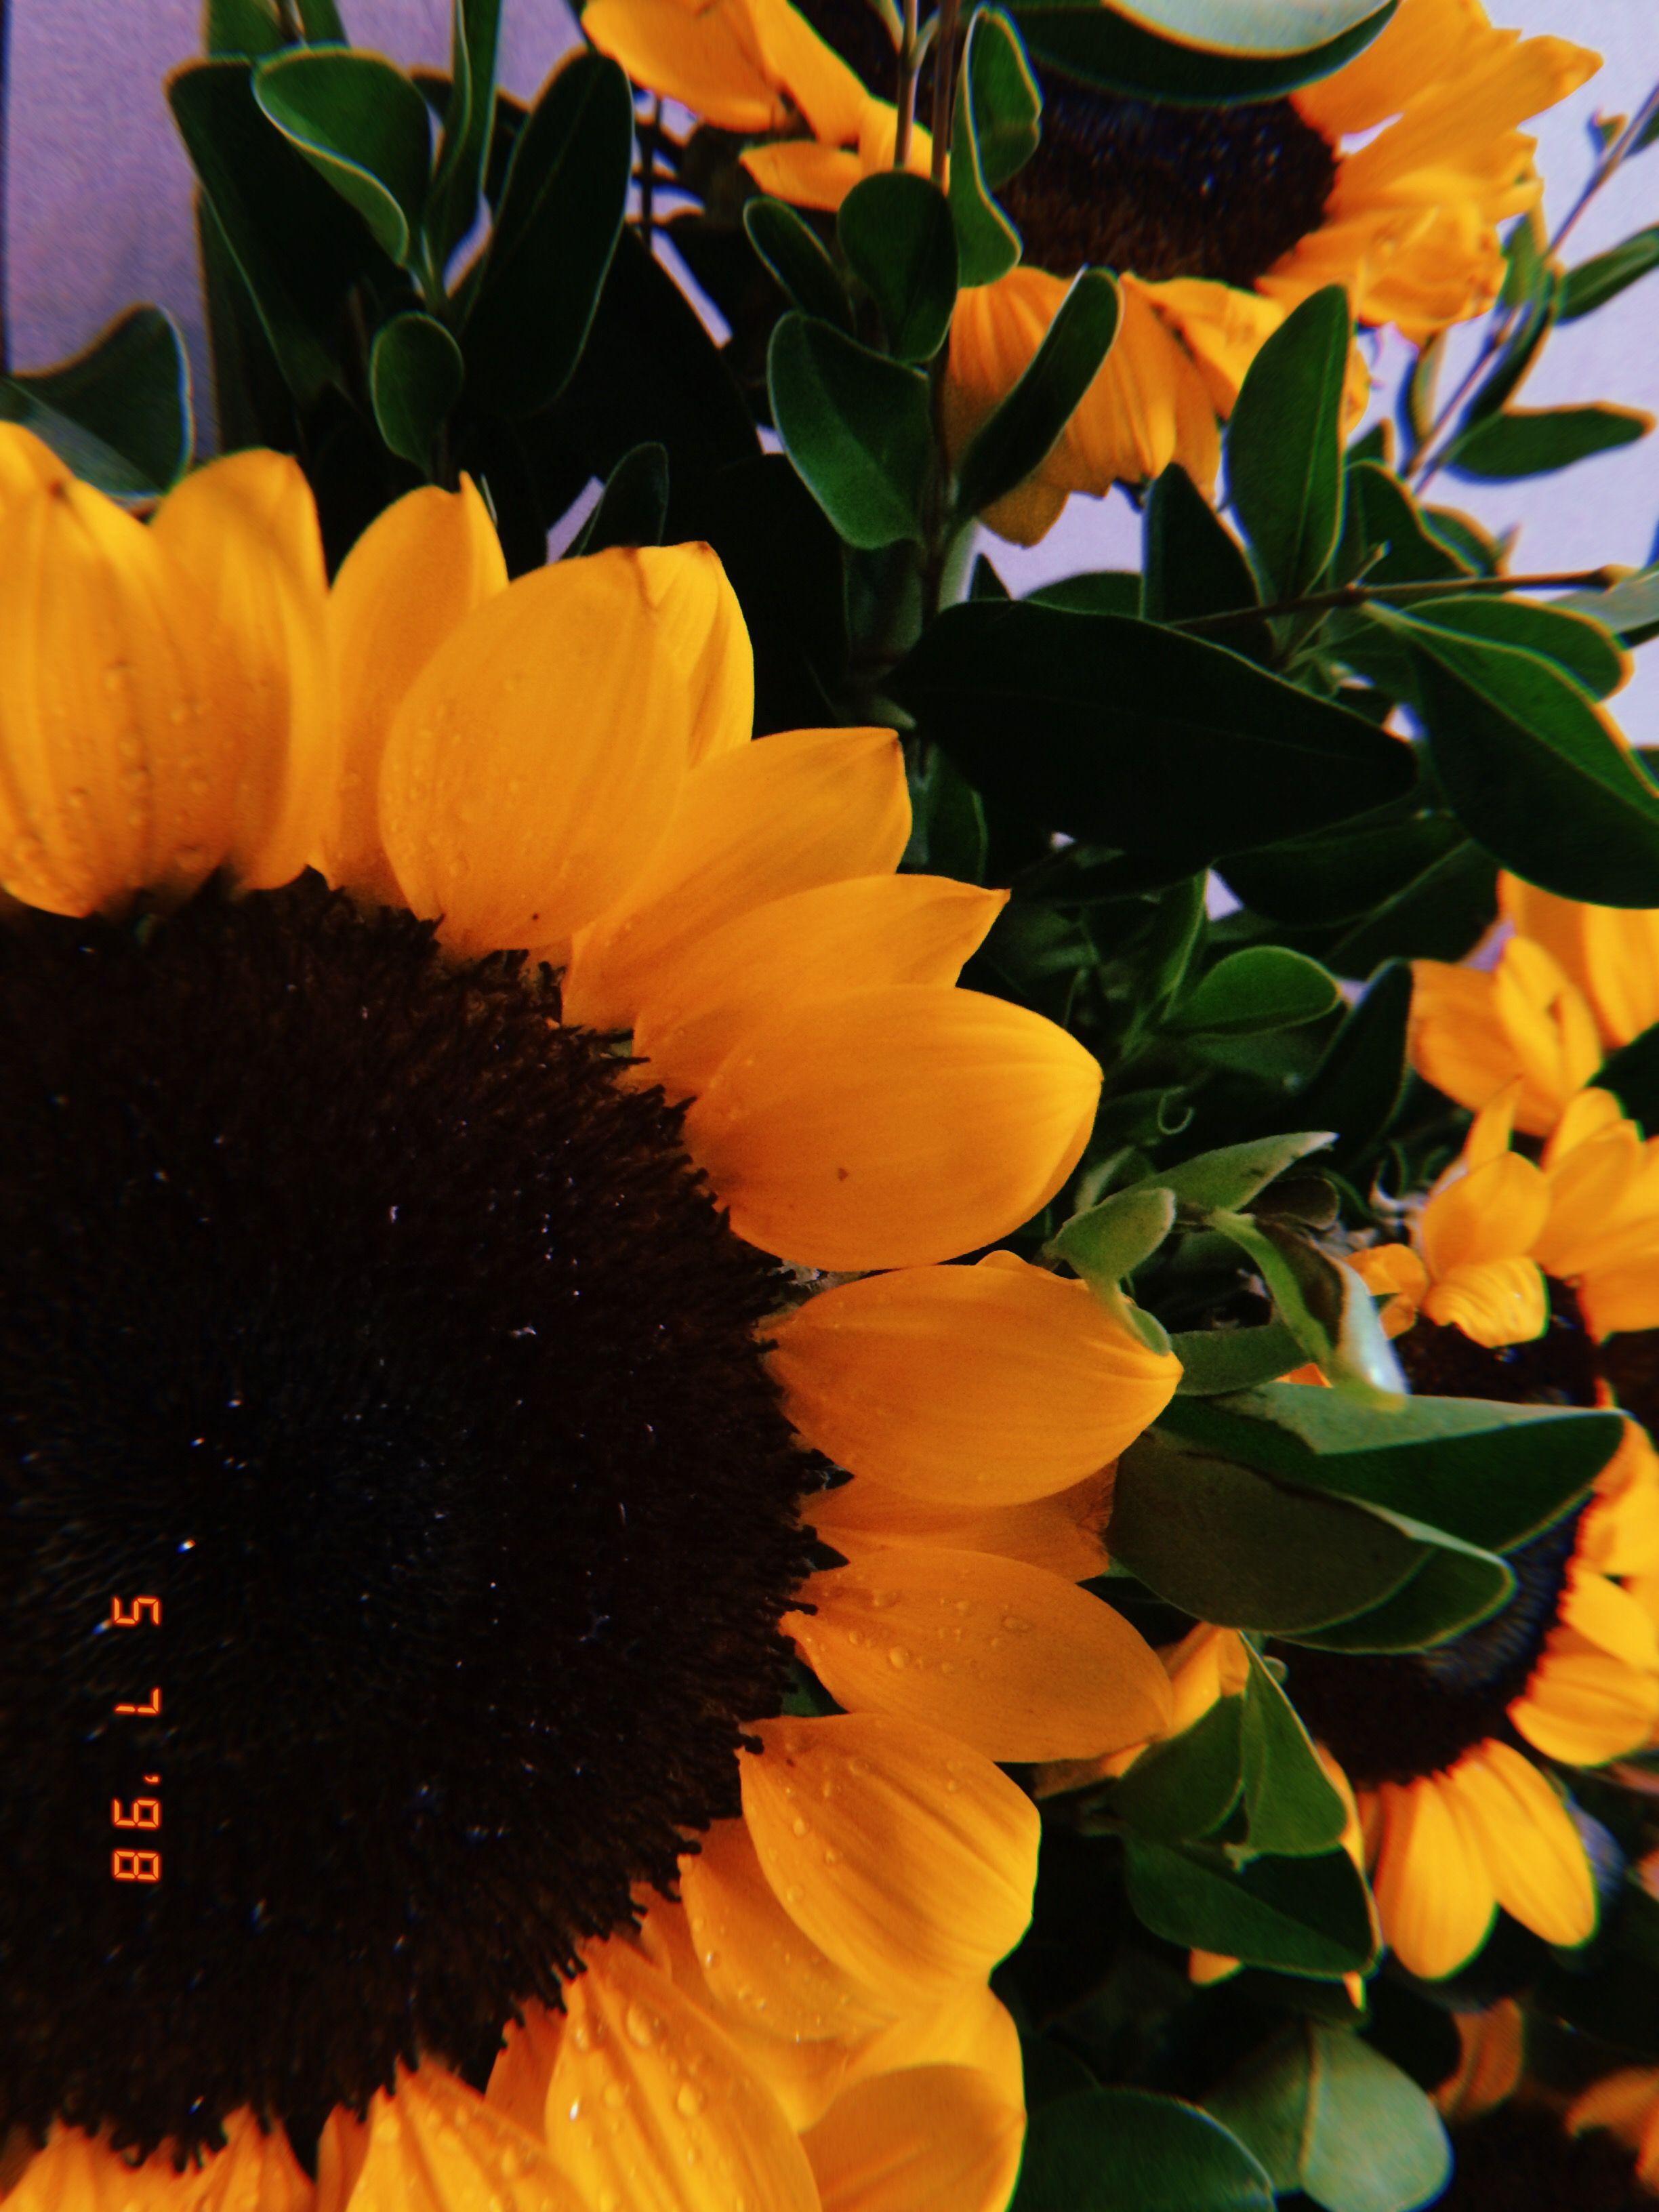 pinterest кαℓєyнσggℓє Sunflower wallpaper, Beautiful